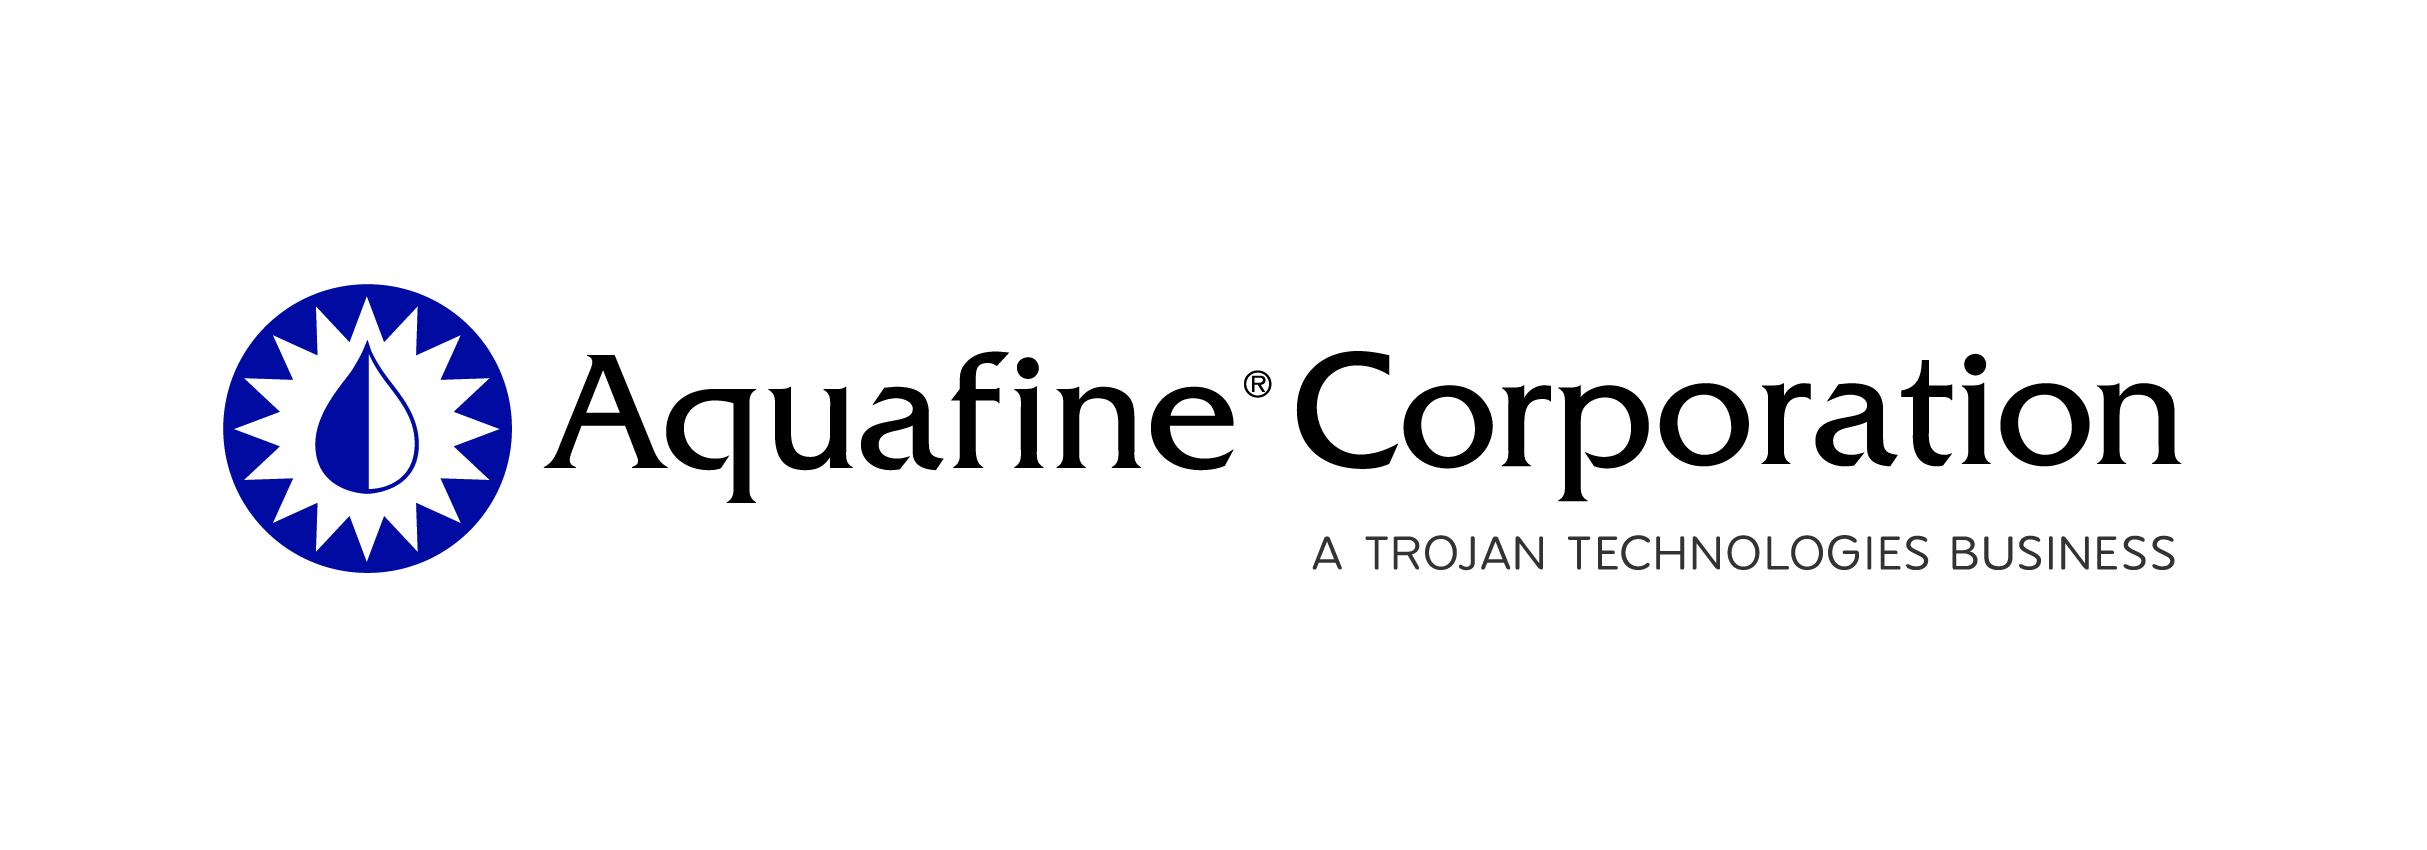 Aquafine Corporation.